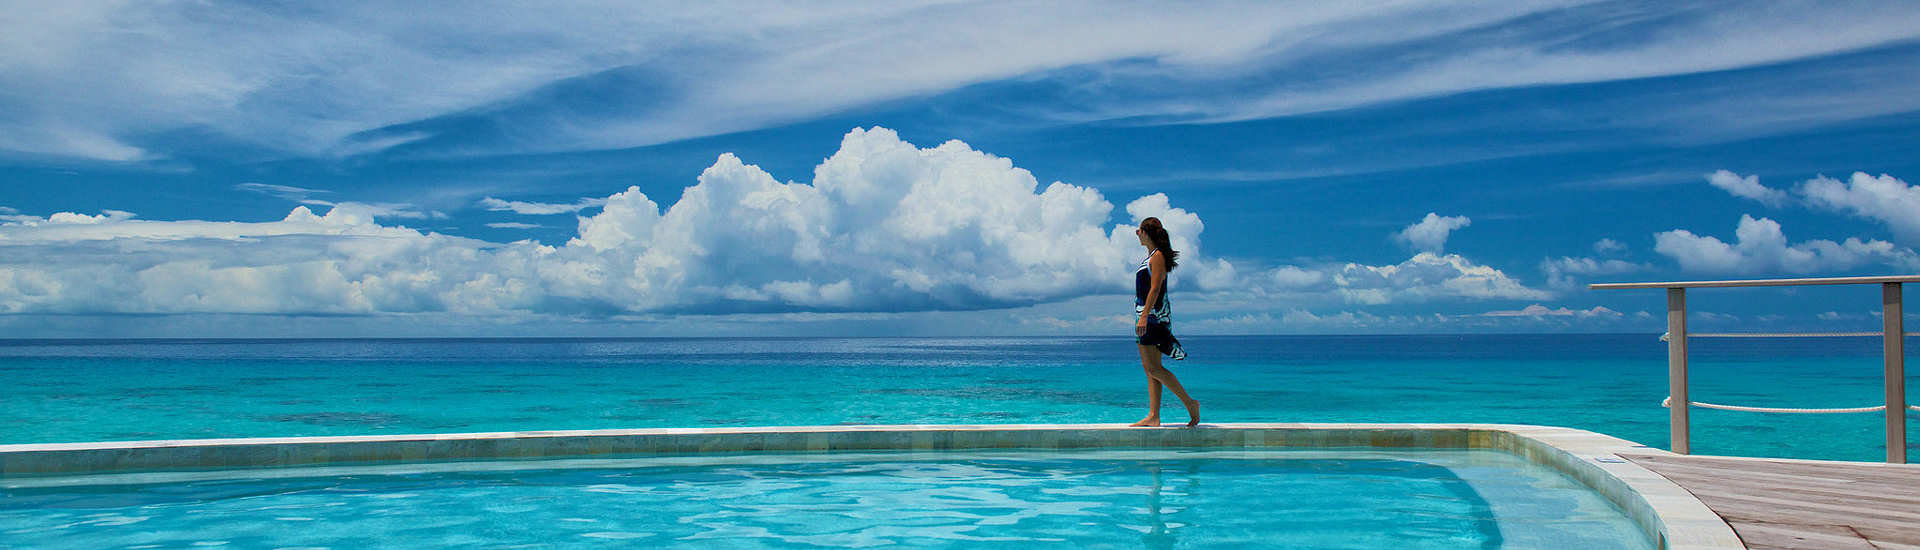 Toller Meerblick – Maitai Hotel auf Rangiroa